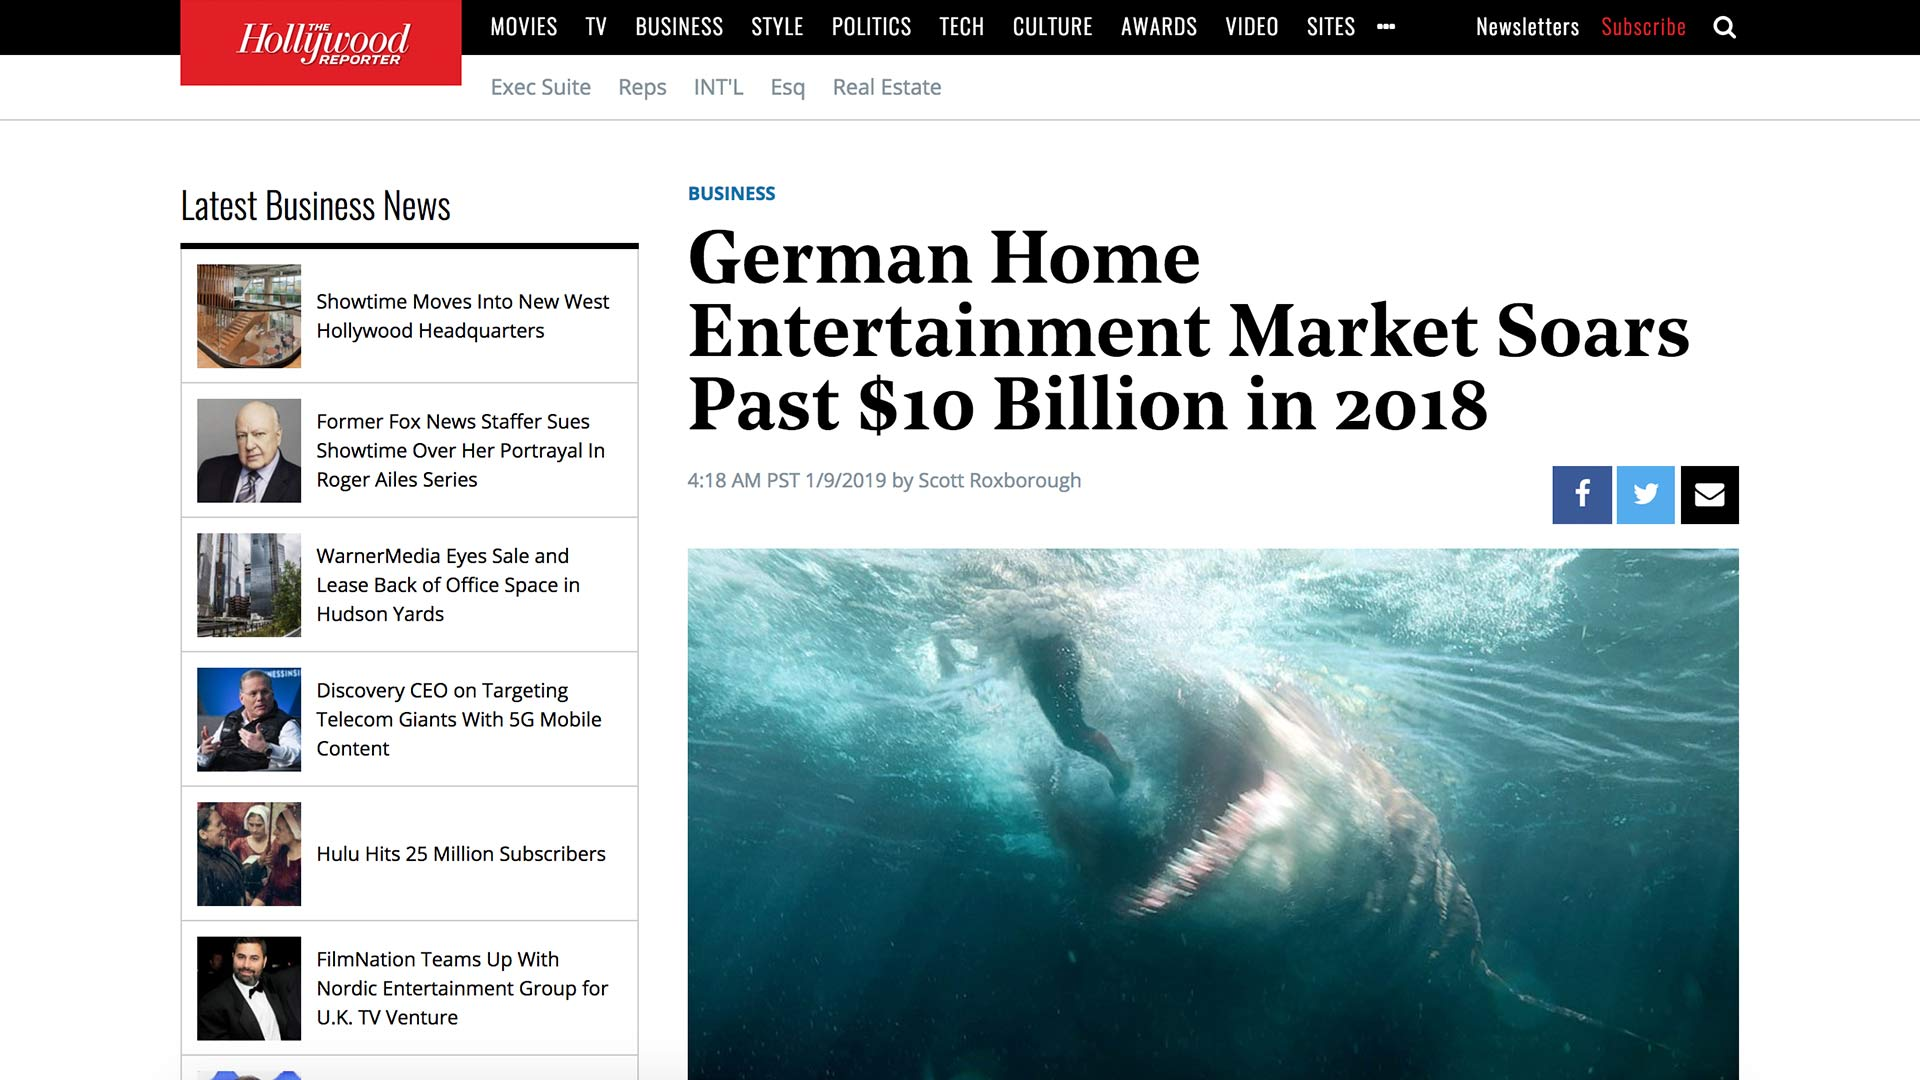 Fairness Rocks News German Home Entertainment Market Soars Past $10 Billion in 2018